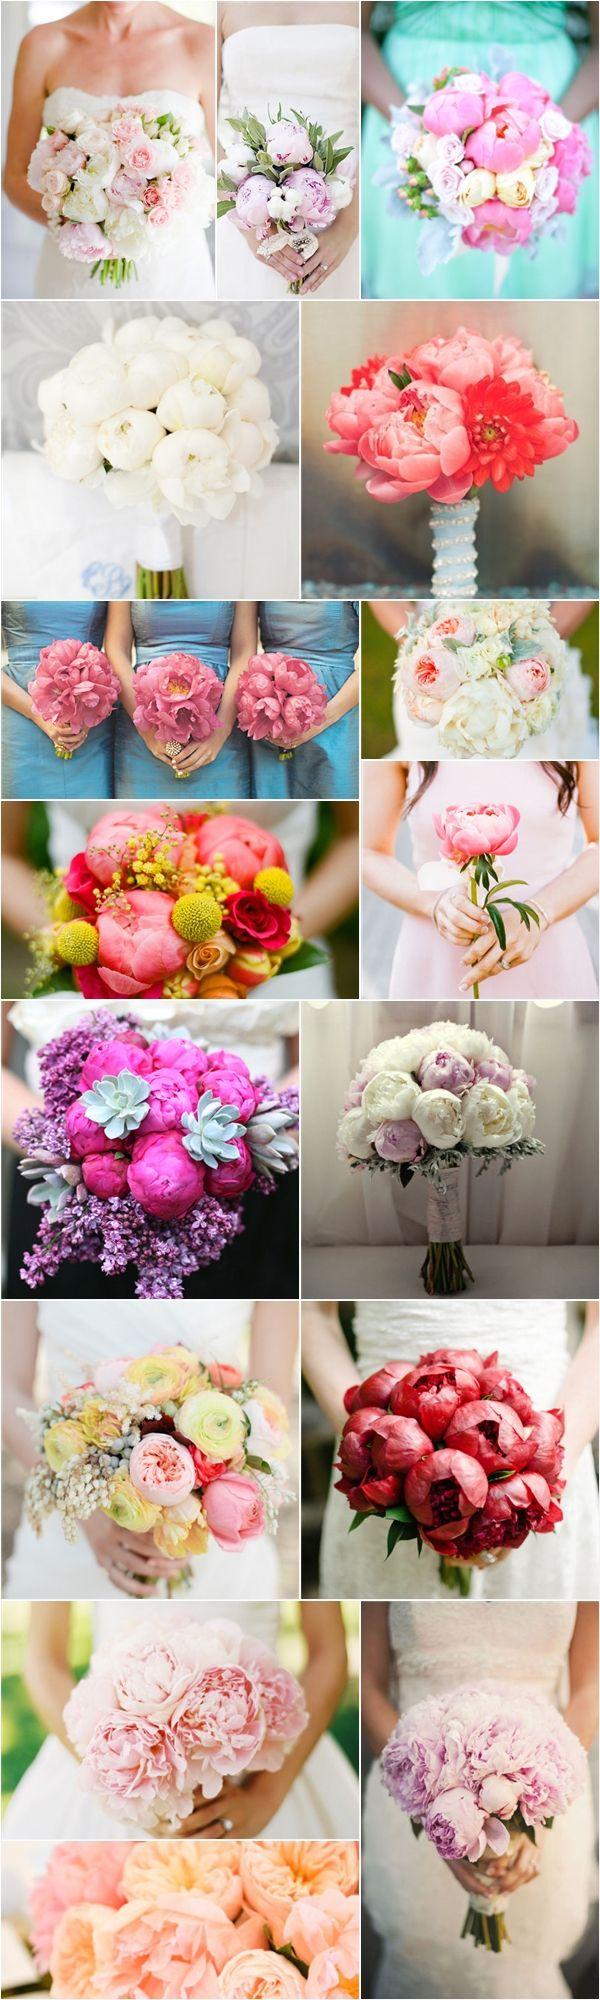 Praise Wedding » Wedding Inspiration and Planning » Wedding Floral Trend – Peonies